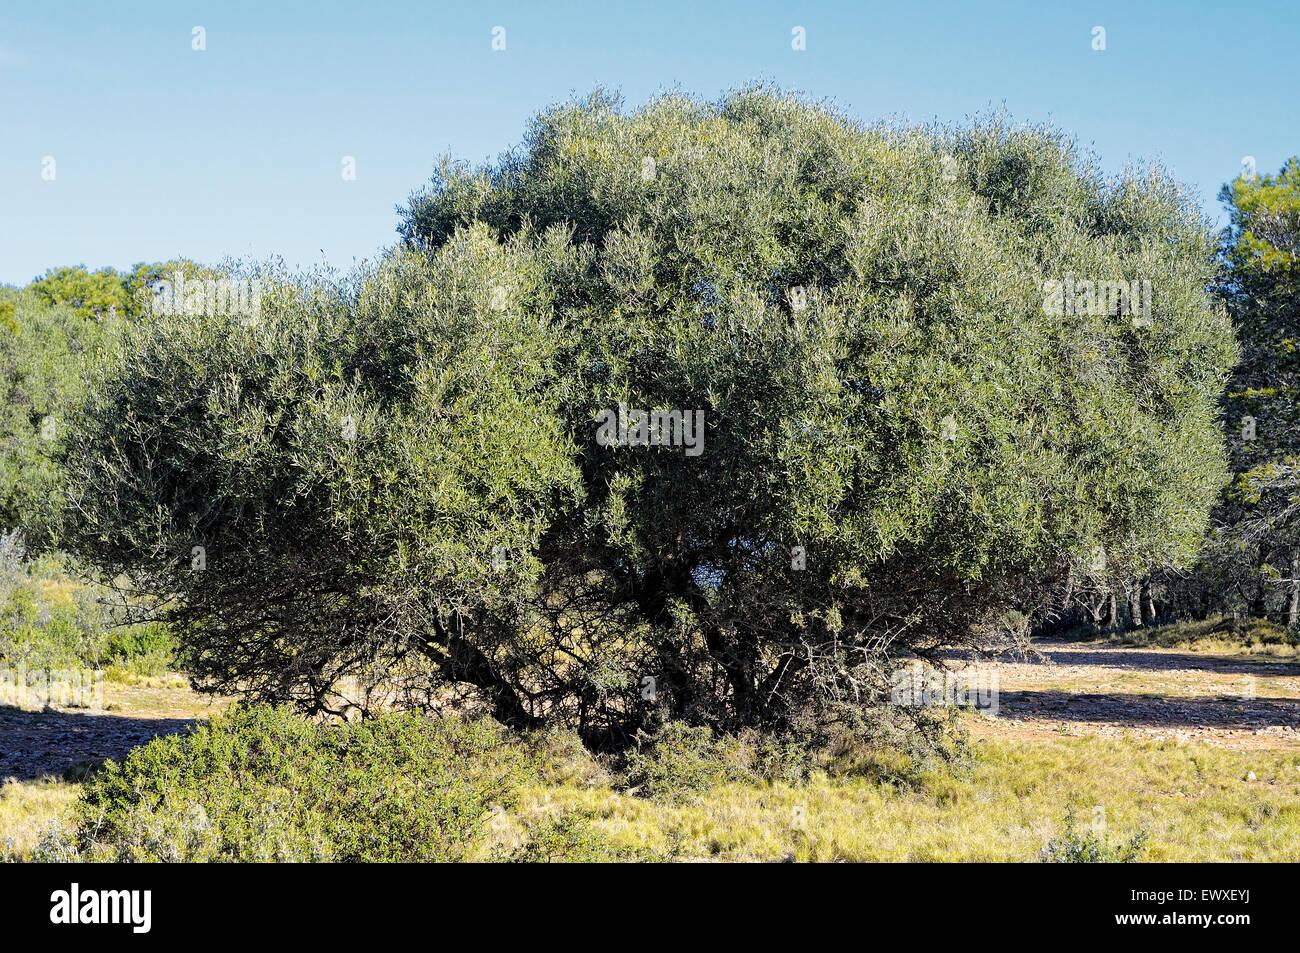 wild olive tree olea europaea var sylvestris in the. Black Bedroom Furniture Sets. Home Design Ideas